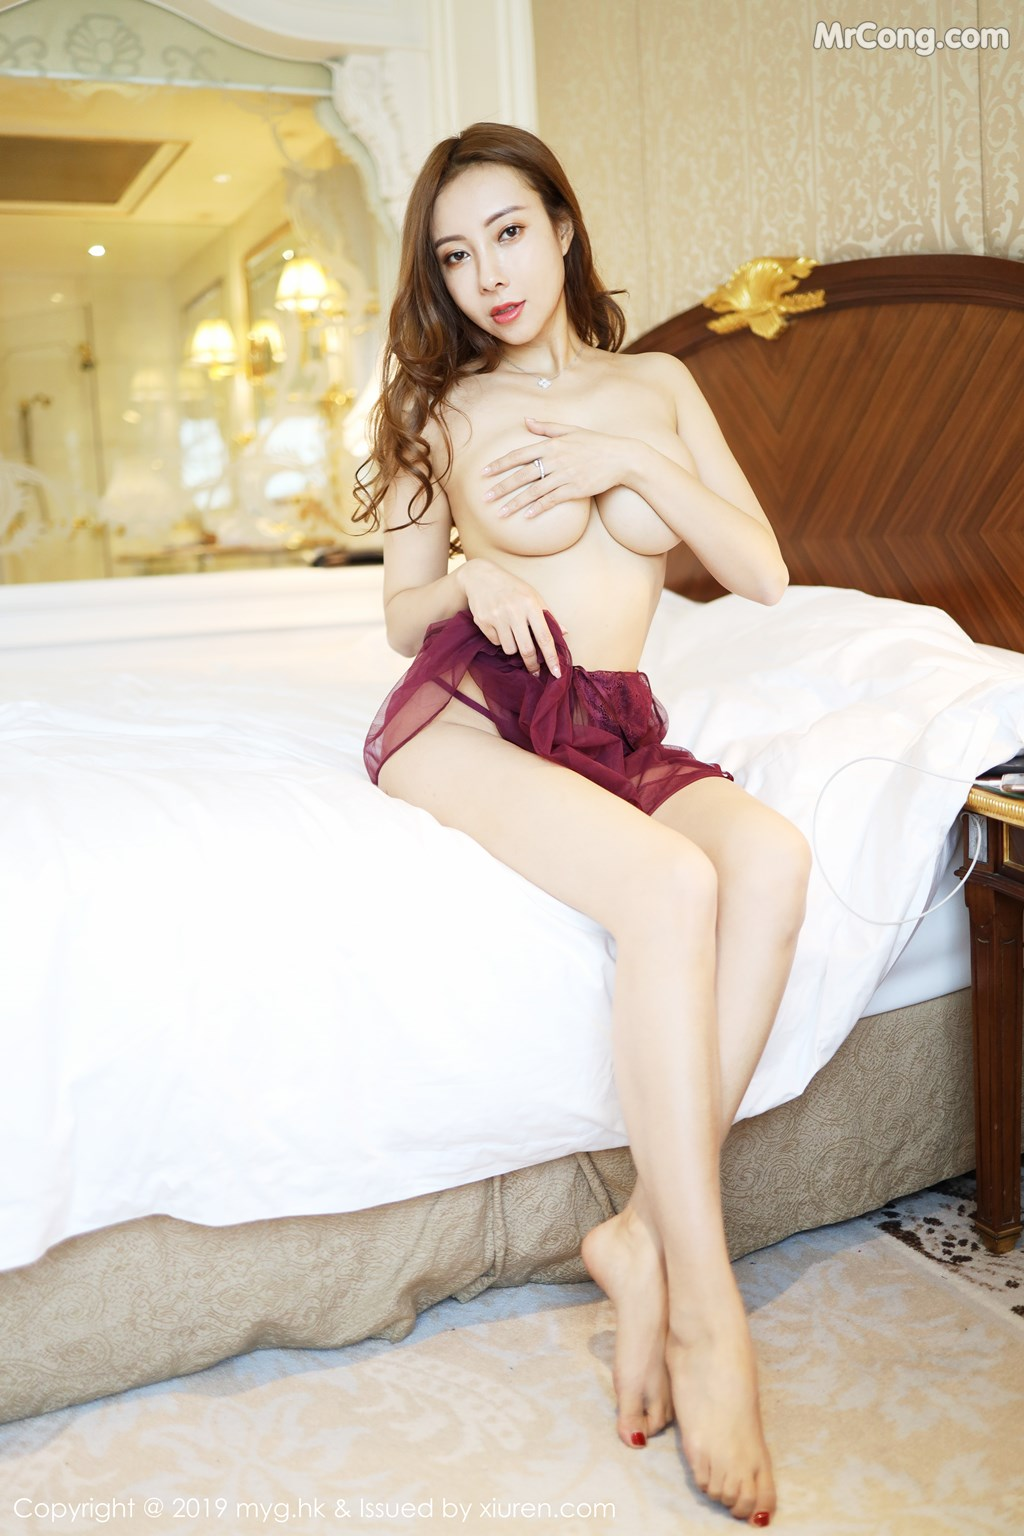 Image MyGirl-Vol.352-Victoria-Guo-Er-MrCong.com-003 in post MyGirl Vol.352: Victoria (果儿) (40 ảnh)